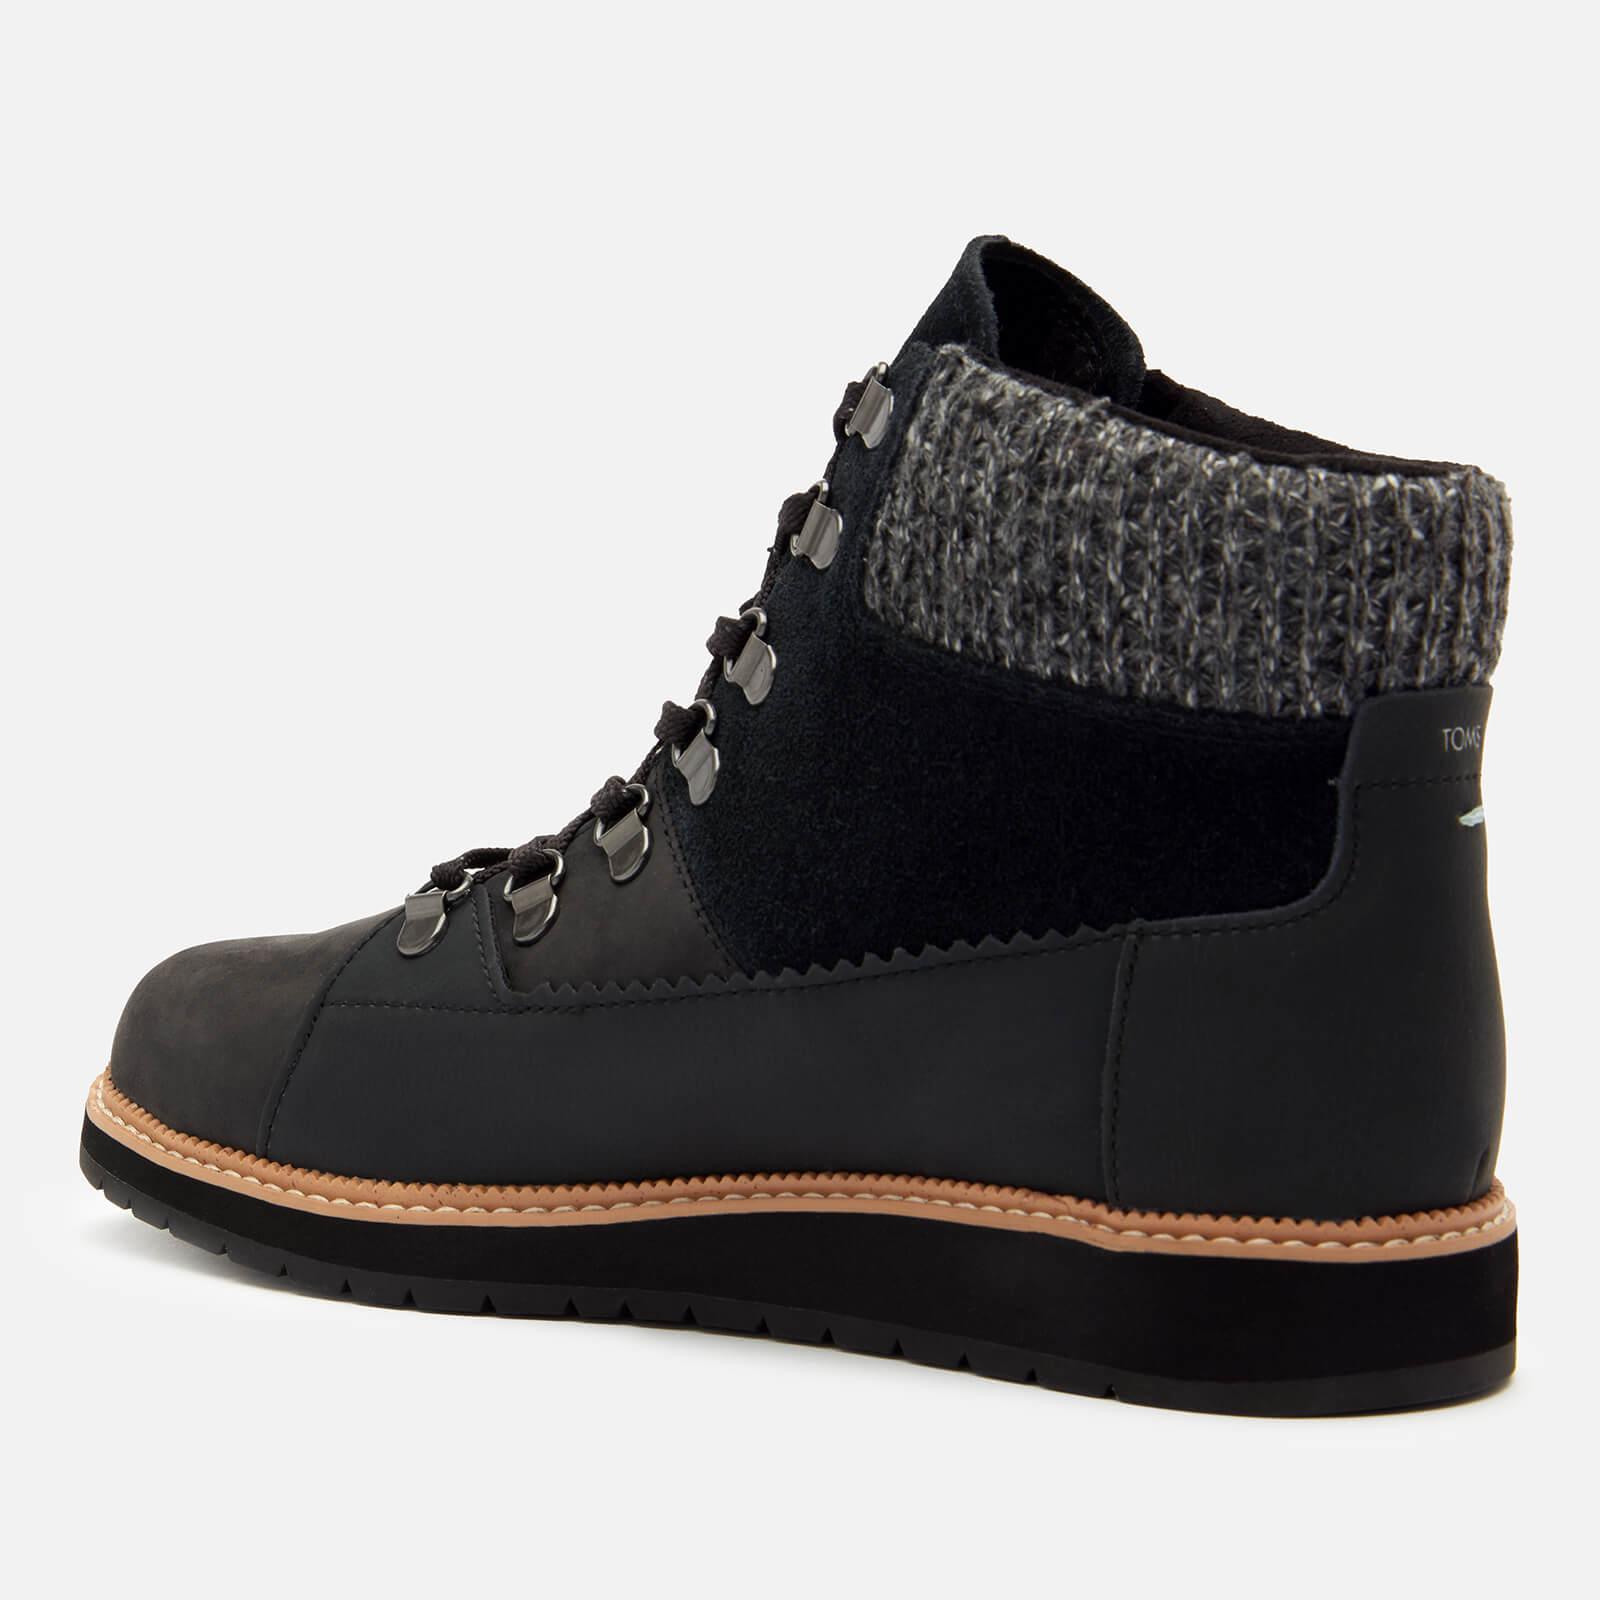 Toms Women's Mesa Waterproof Nubuck Leather Hiking Style Boots - Black - Uk 3